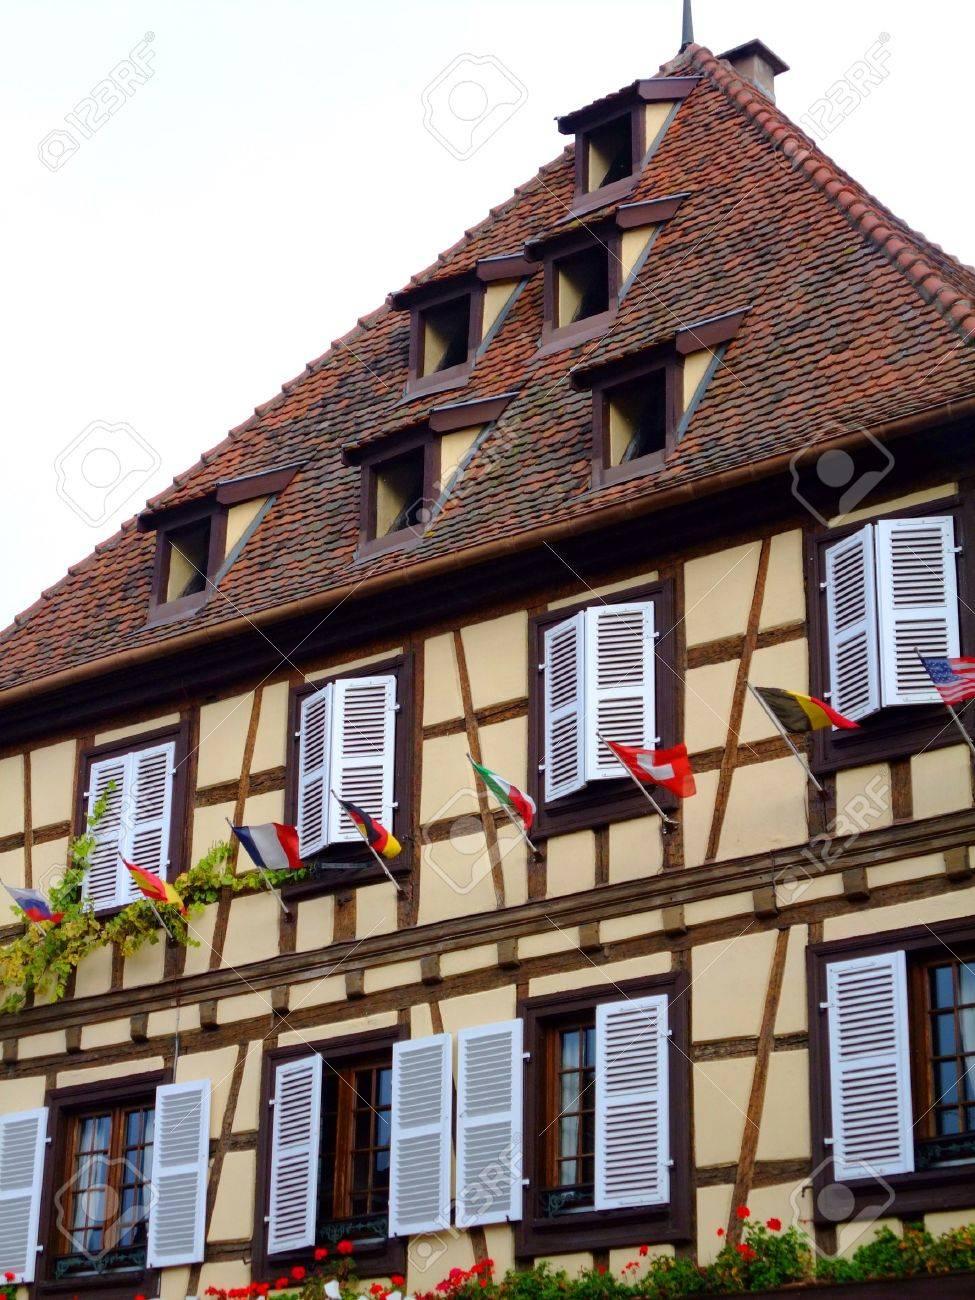 Half-timbered house facade in Alsace - Obernai France Stock Photo - 4086794